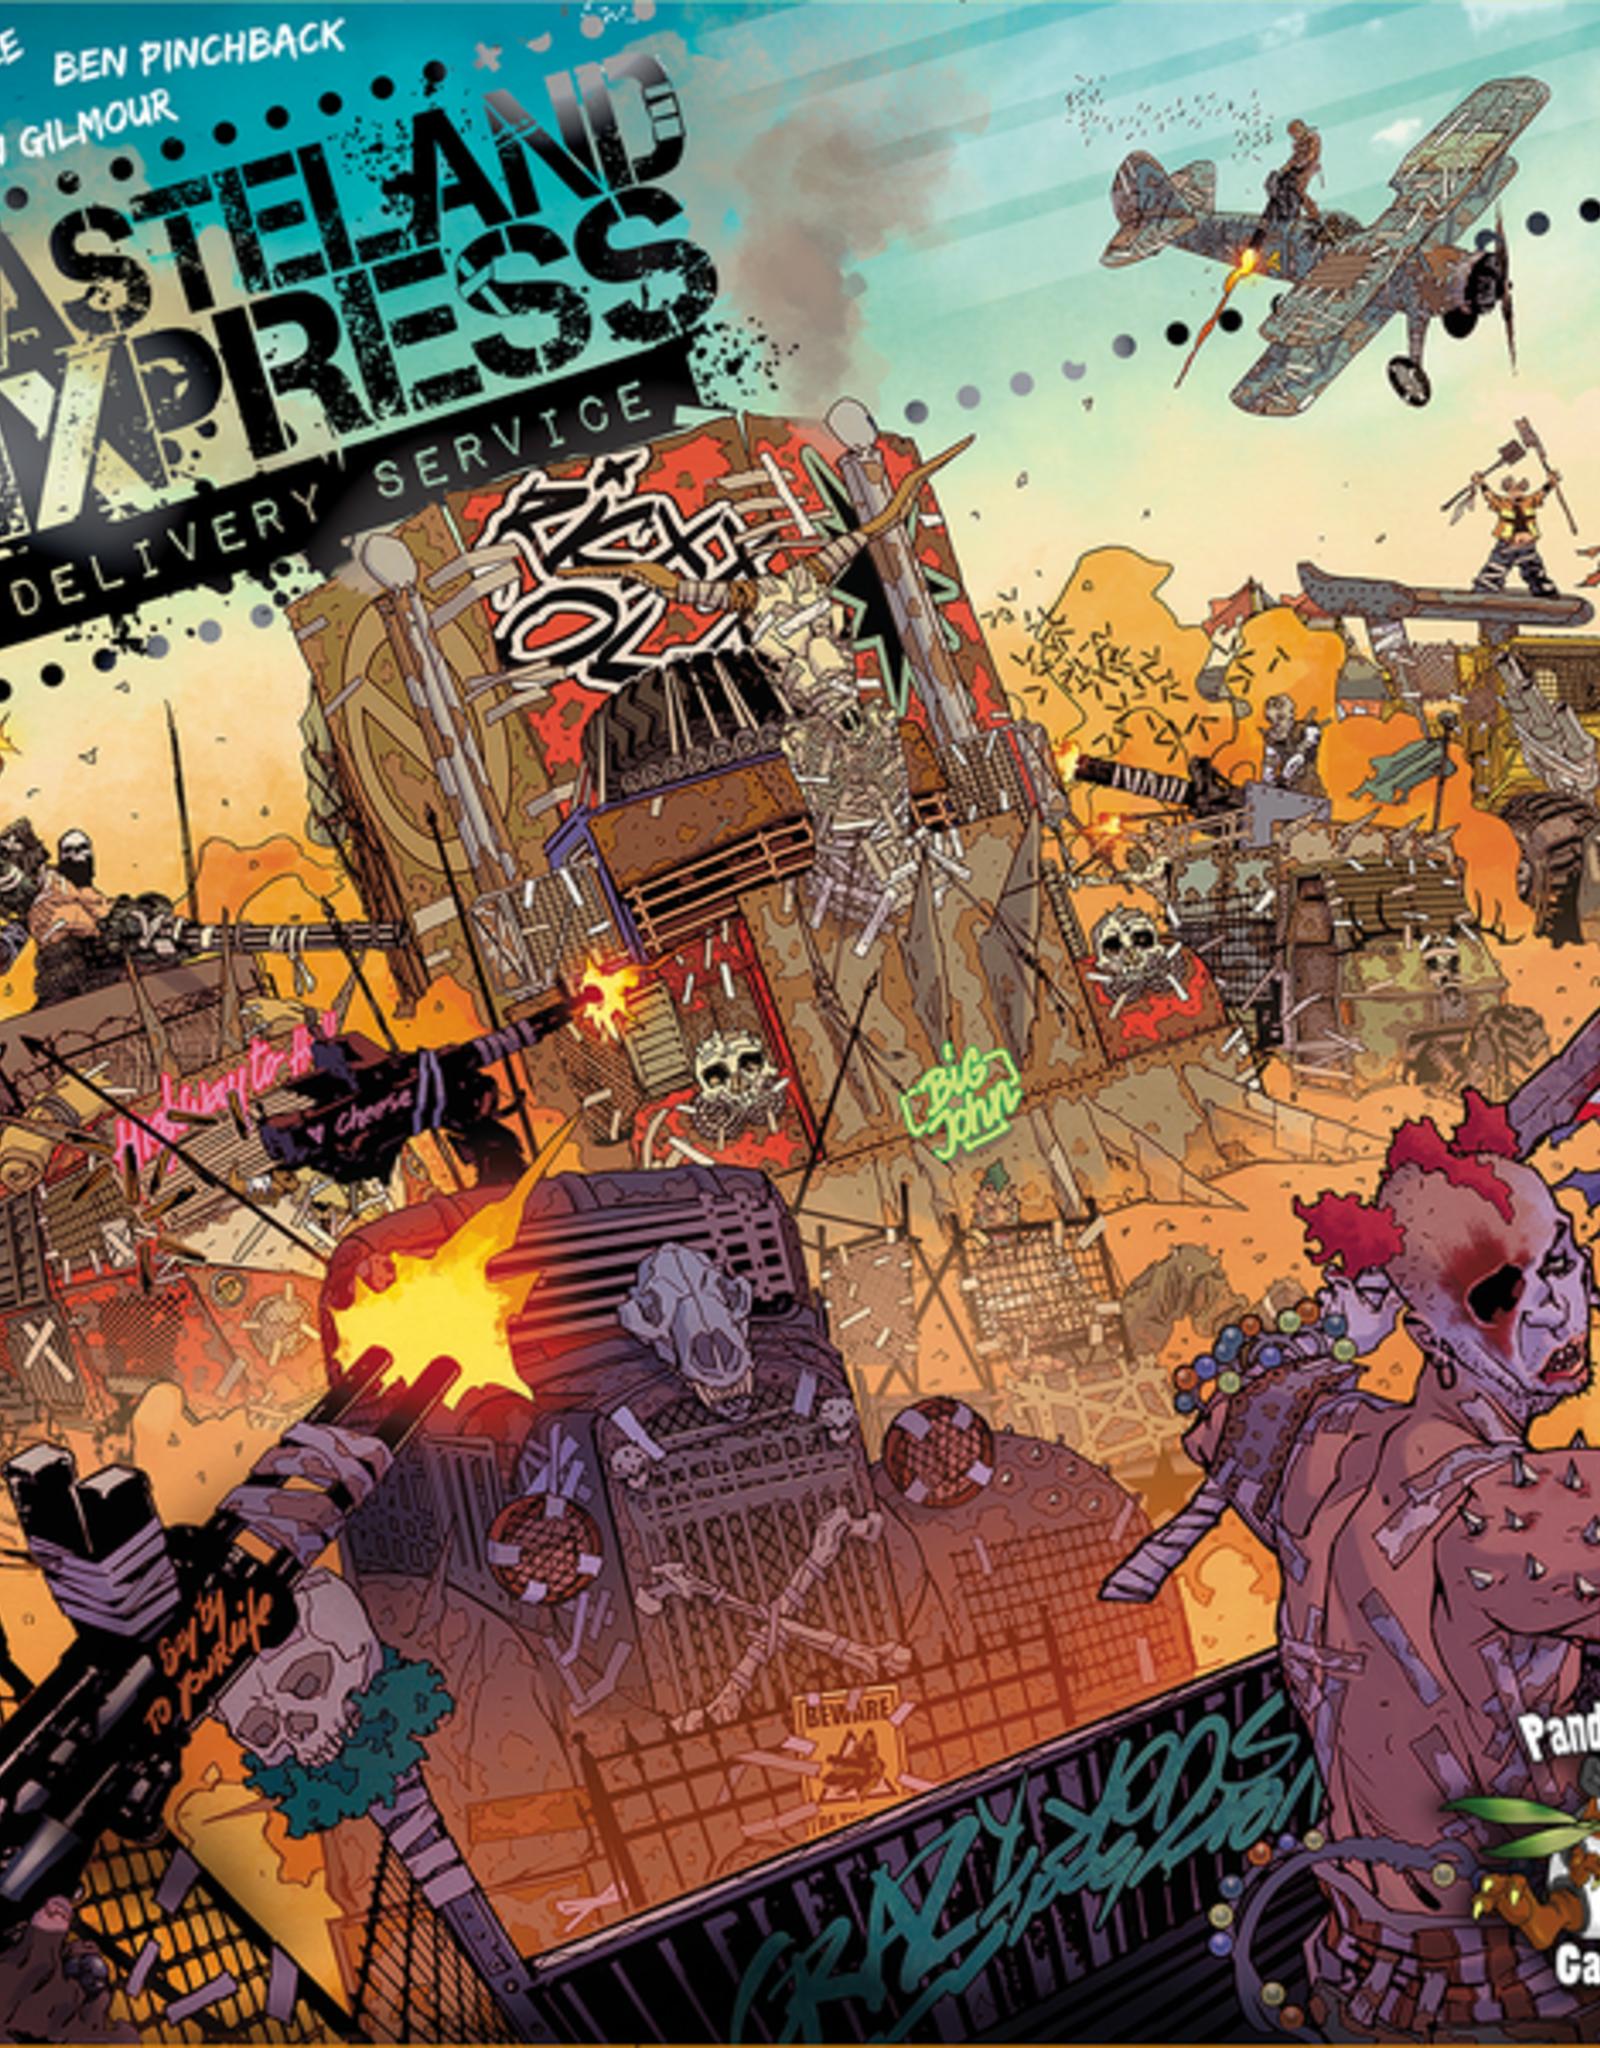 Pandasaurus Games Wasteland Express Delivery Service (EN)